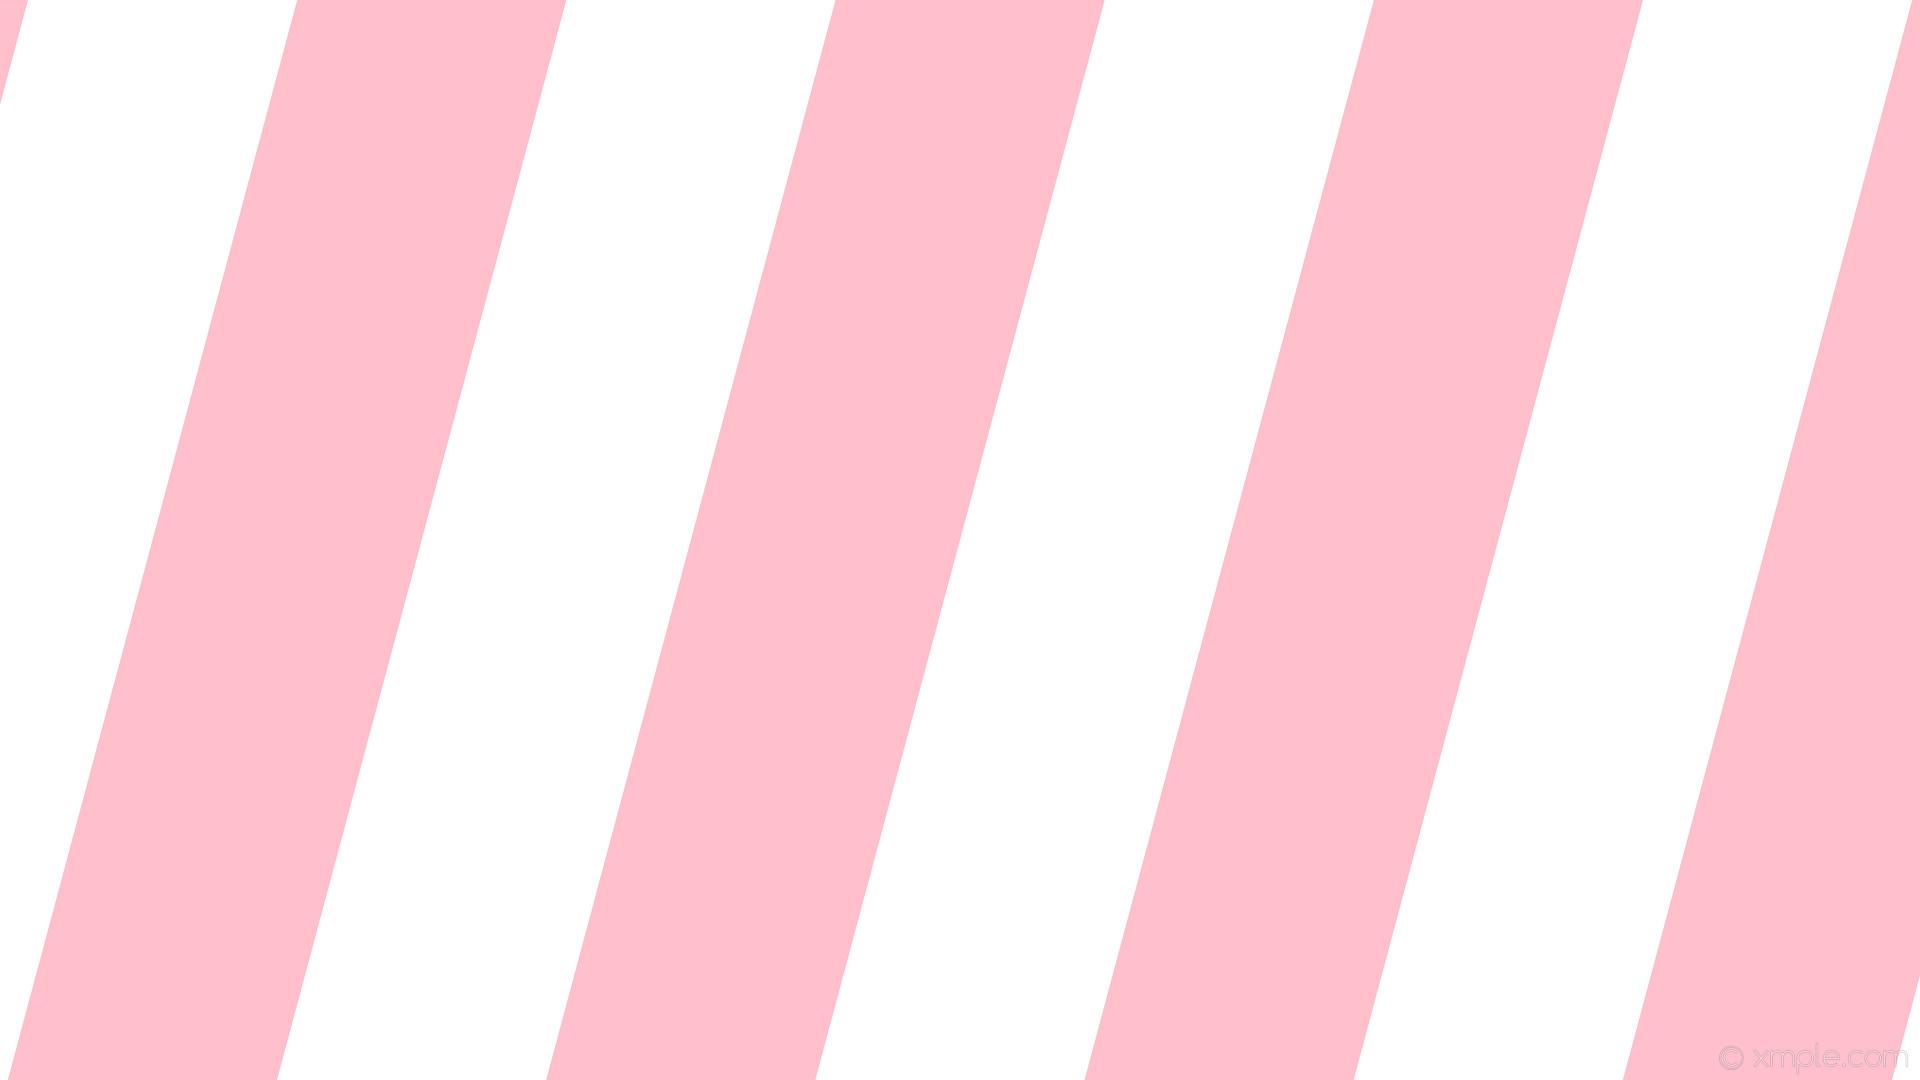 Pink &Amp; White Striped Wallpaper